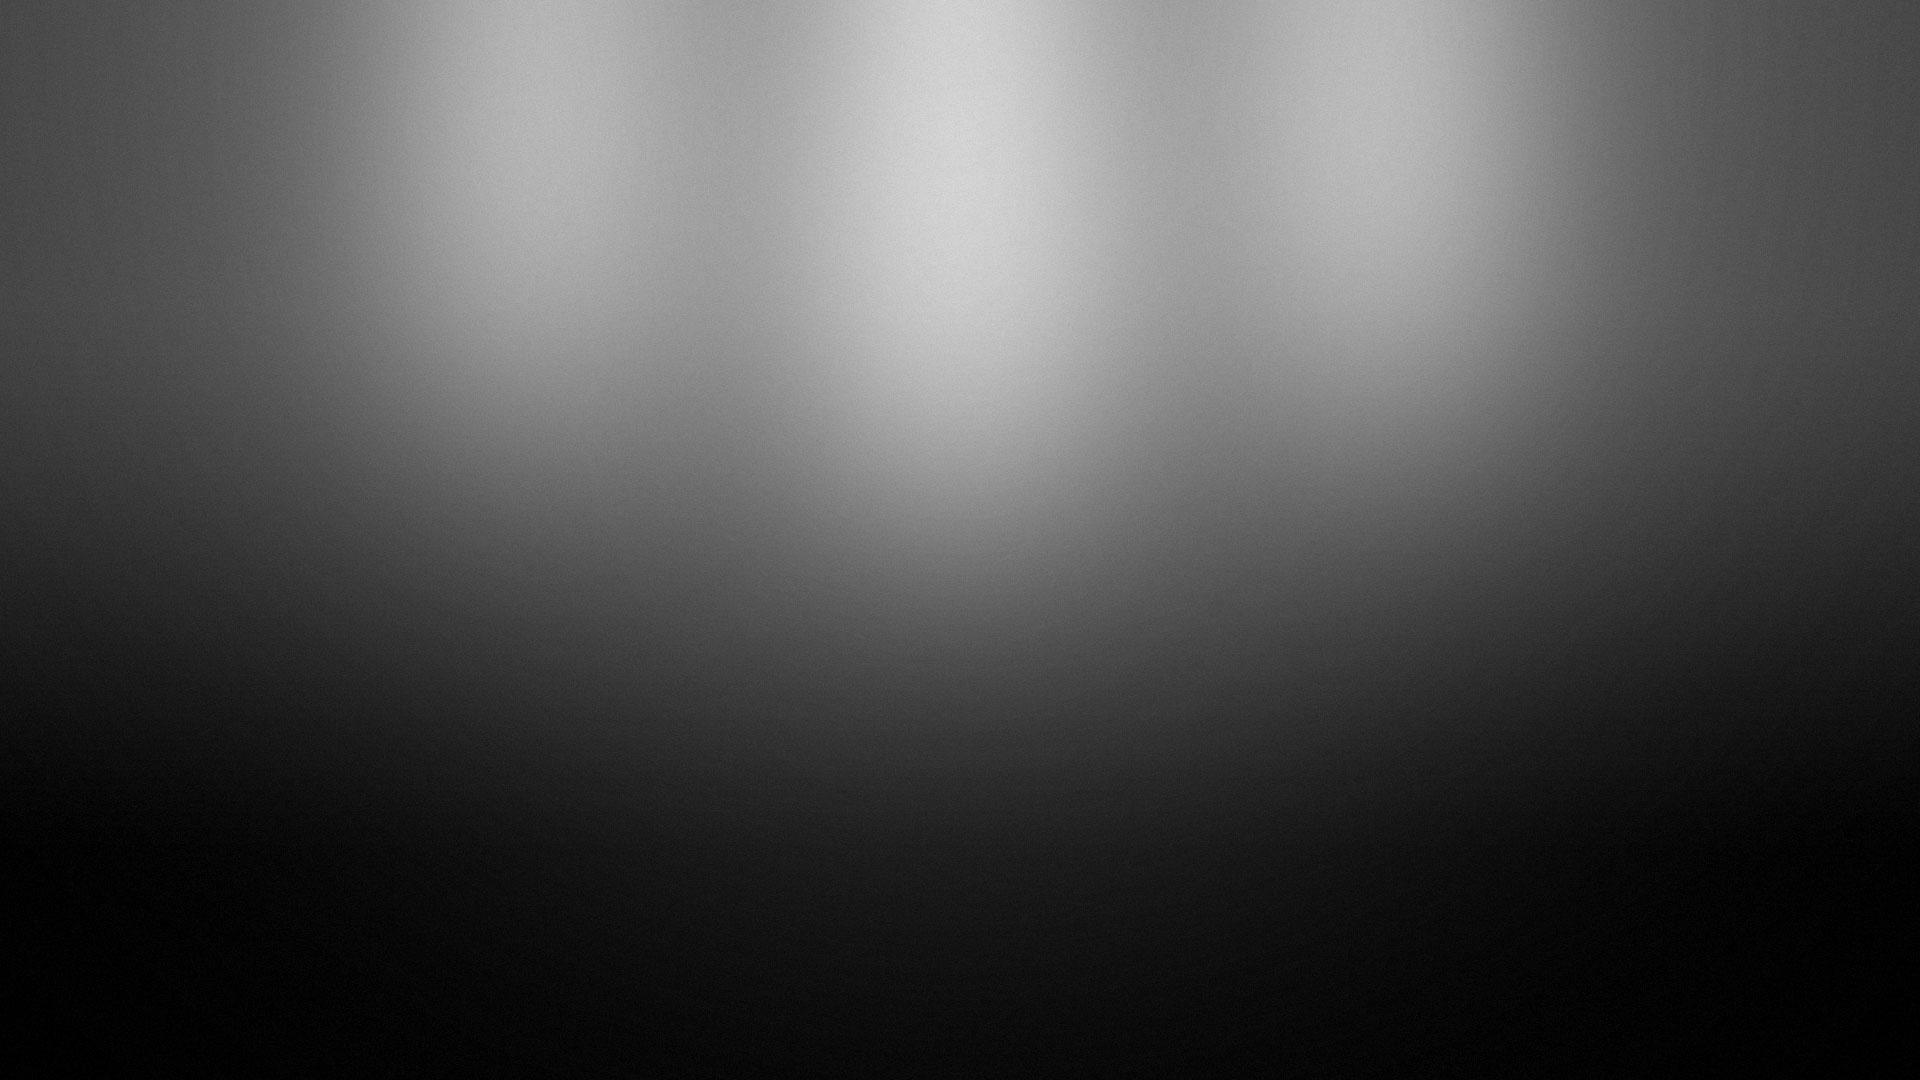 Background Web wallpaper   667473 1920x1080